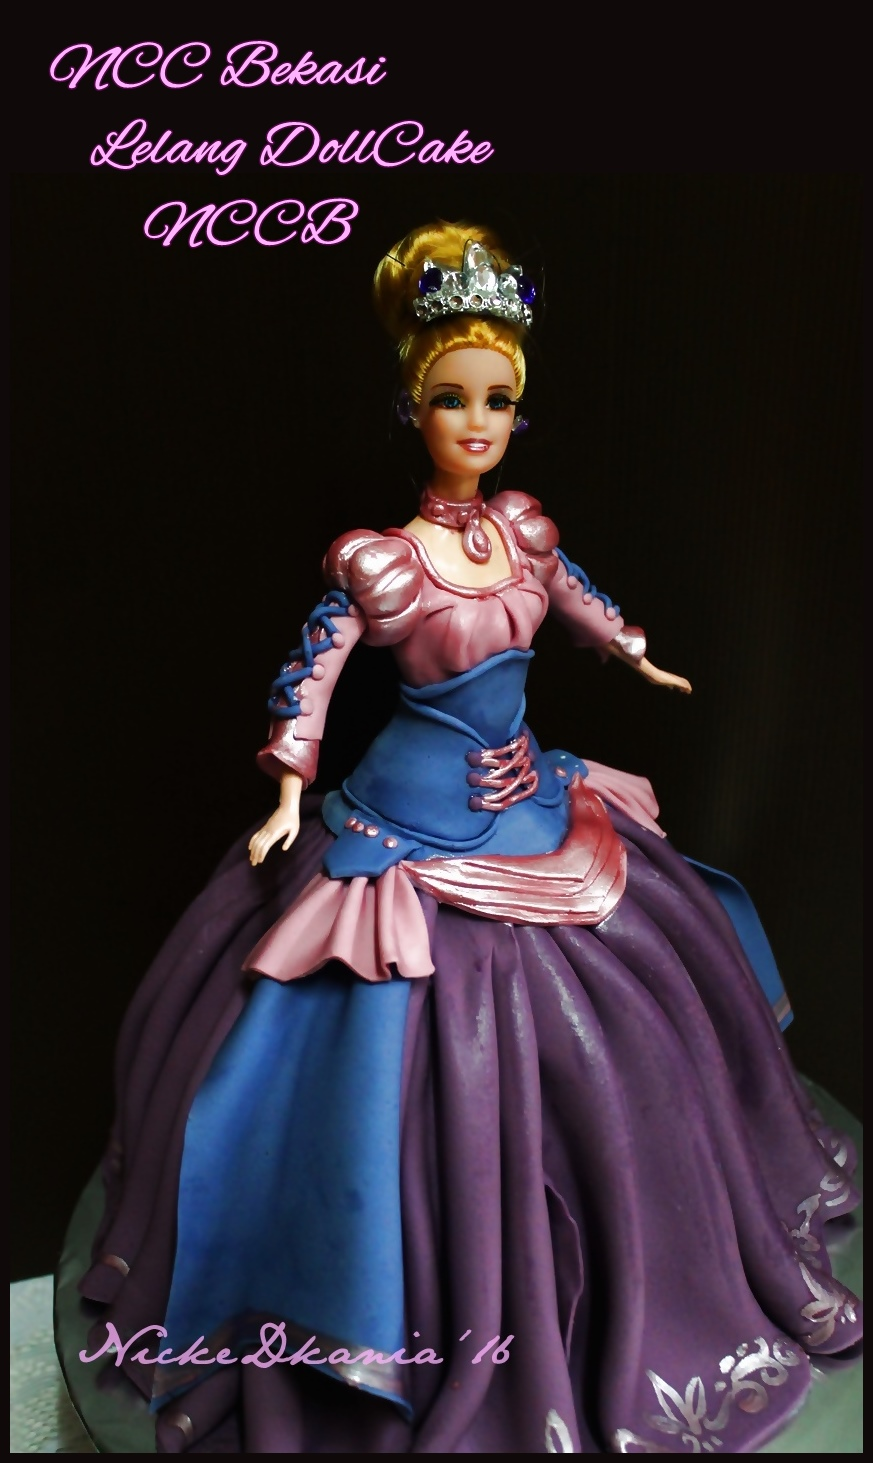 Rapunzel Dollcake for Auction CharityCake